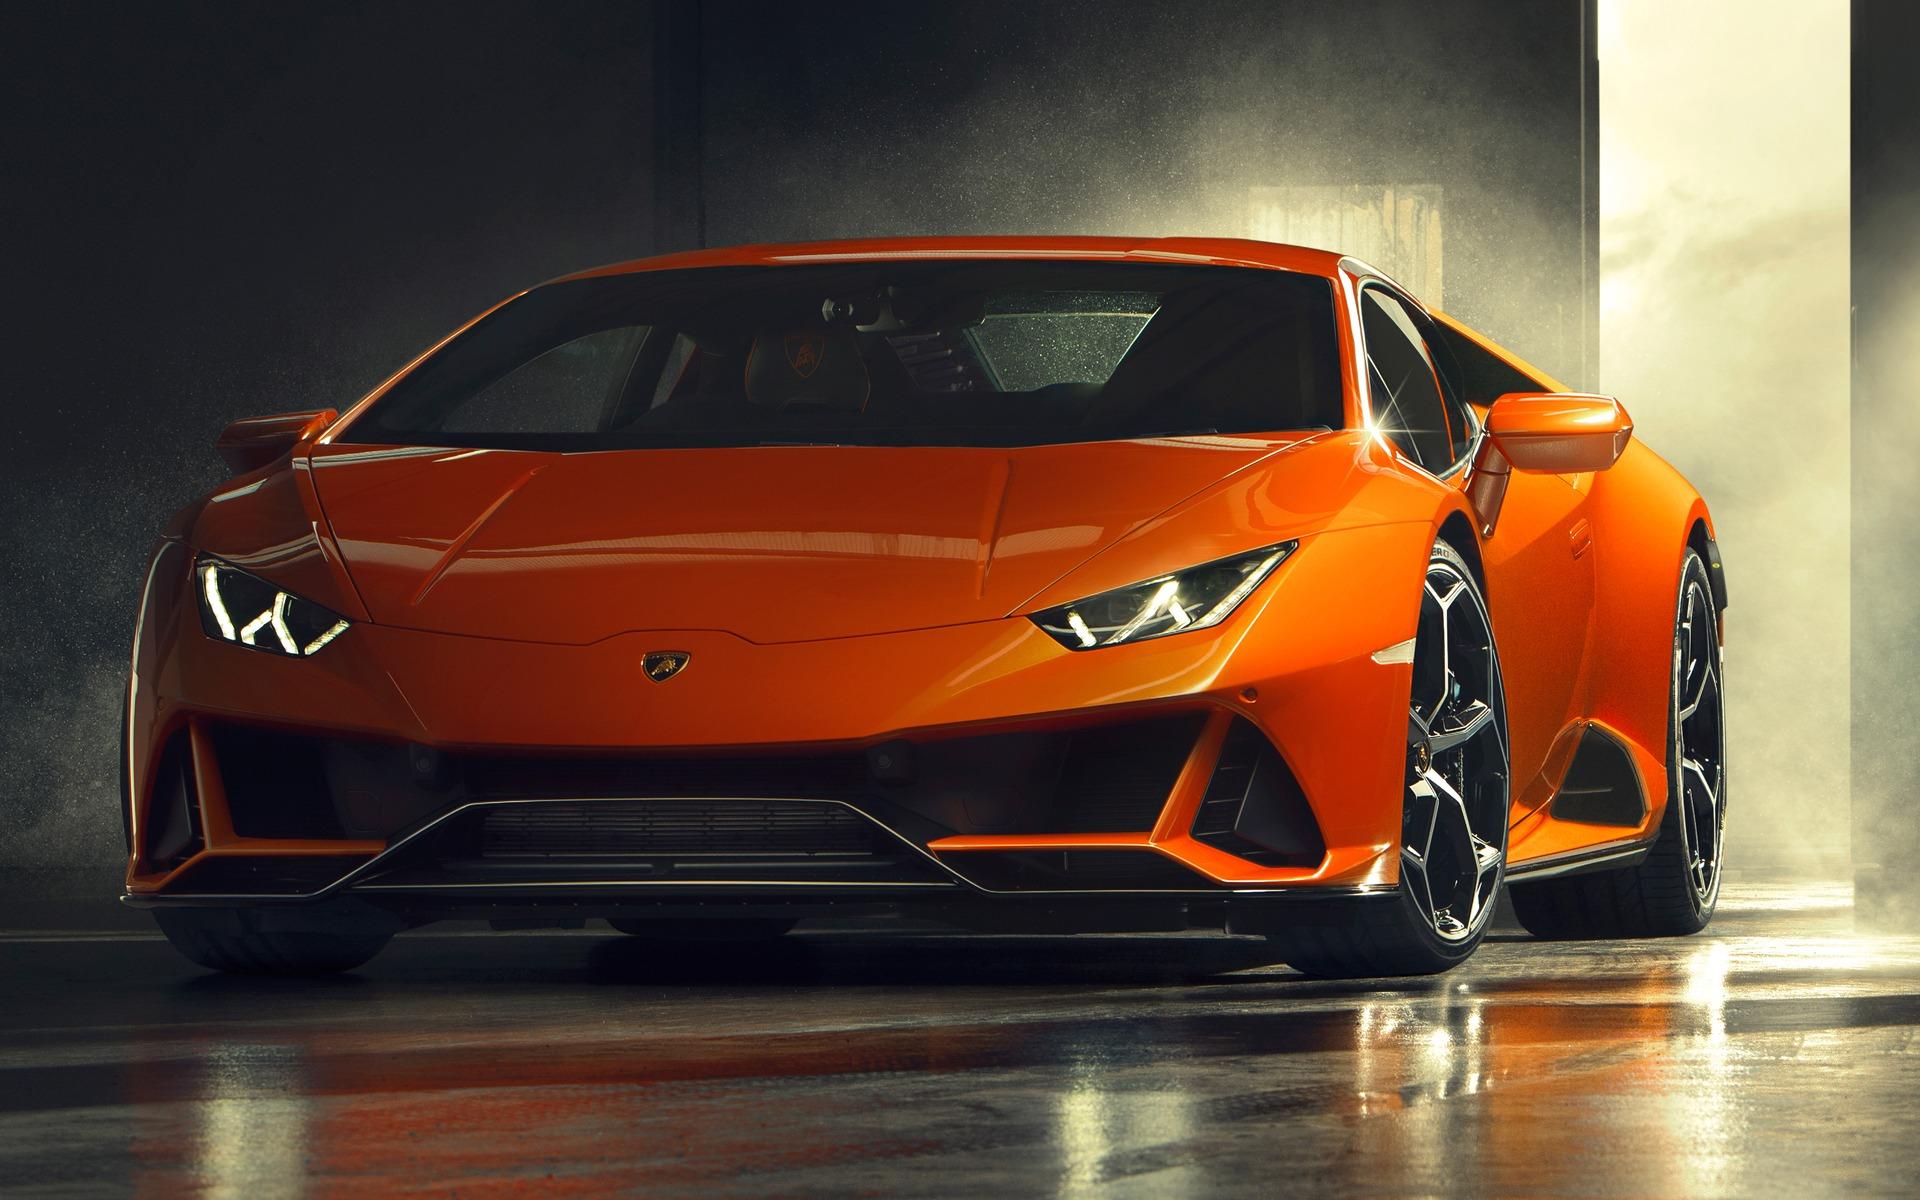 Lamborghini Huracan Evo 2019 Revue Et Corrigee Guide Auto